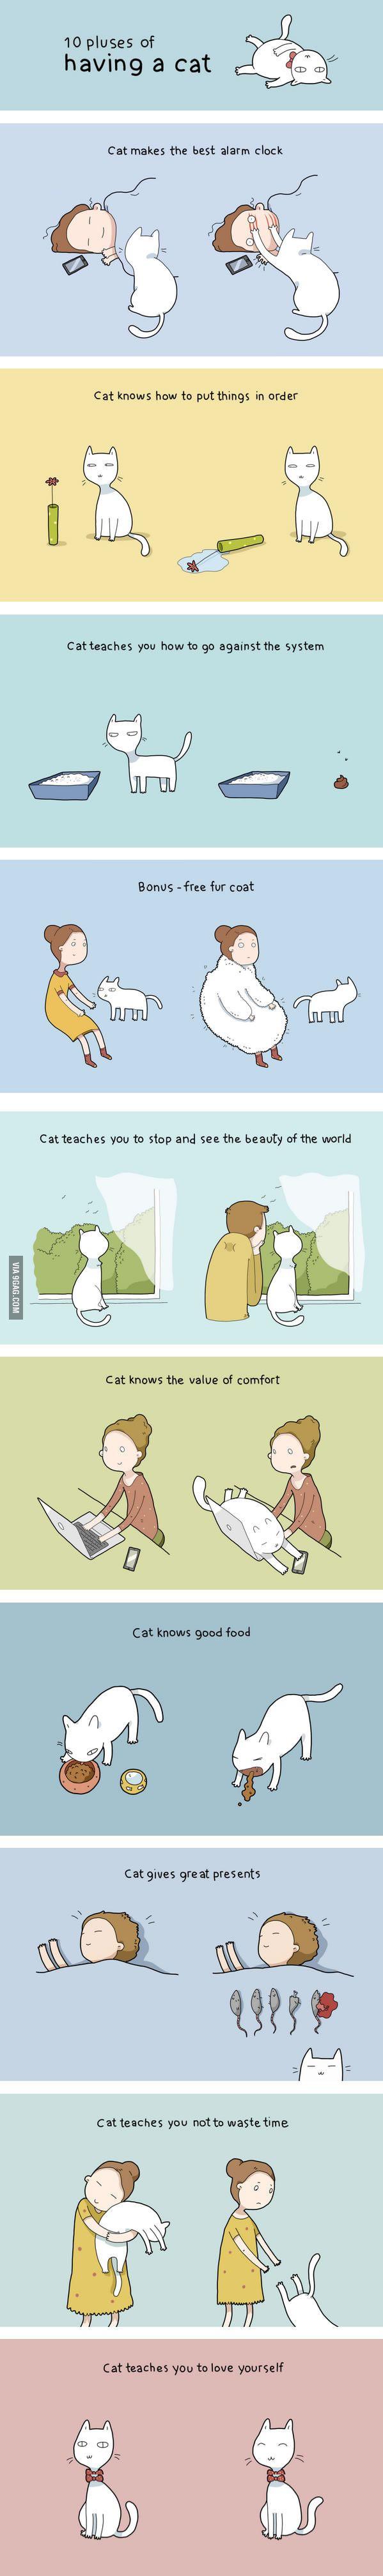 10 Benefits Of Having A Cat